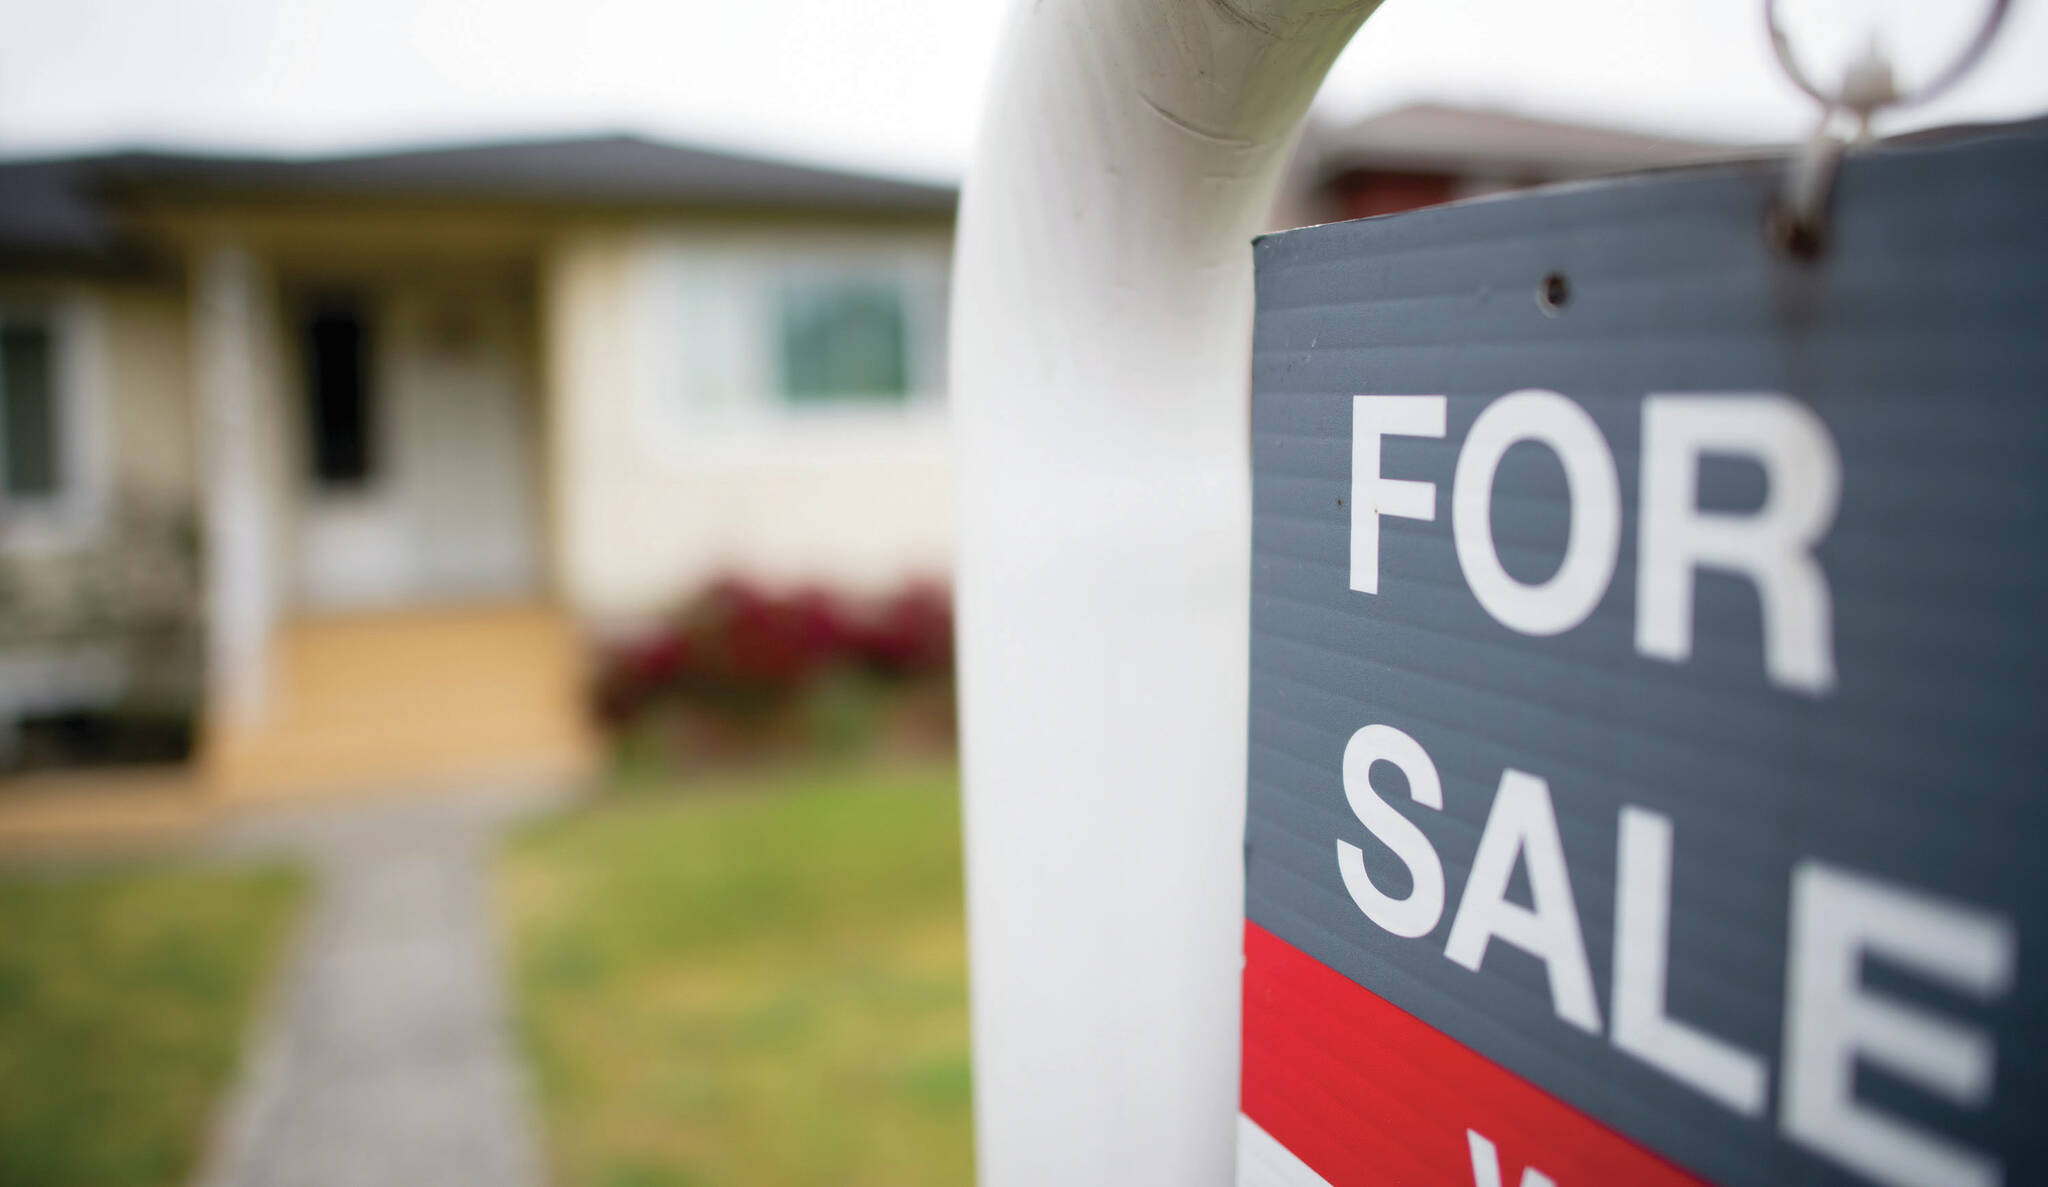 A real estate sign. (THE CANADIAN PRESS Jonathan Hayward)